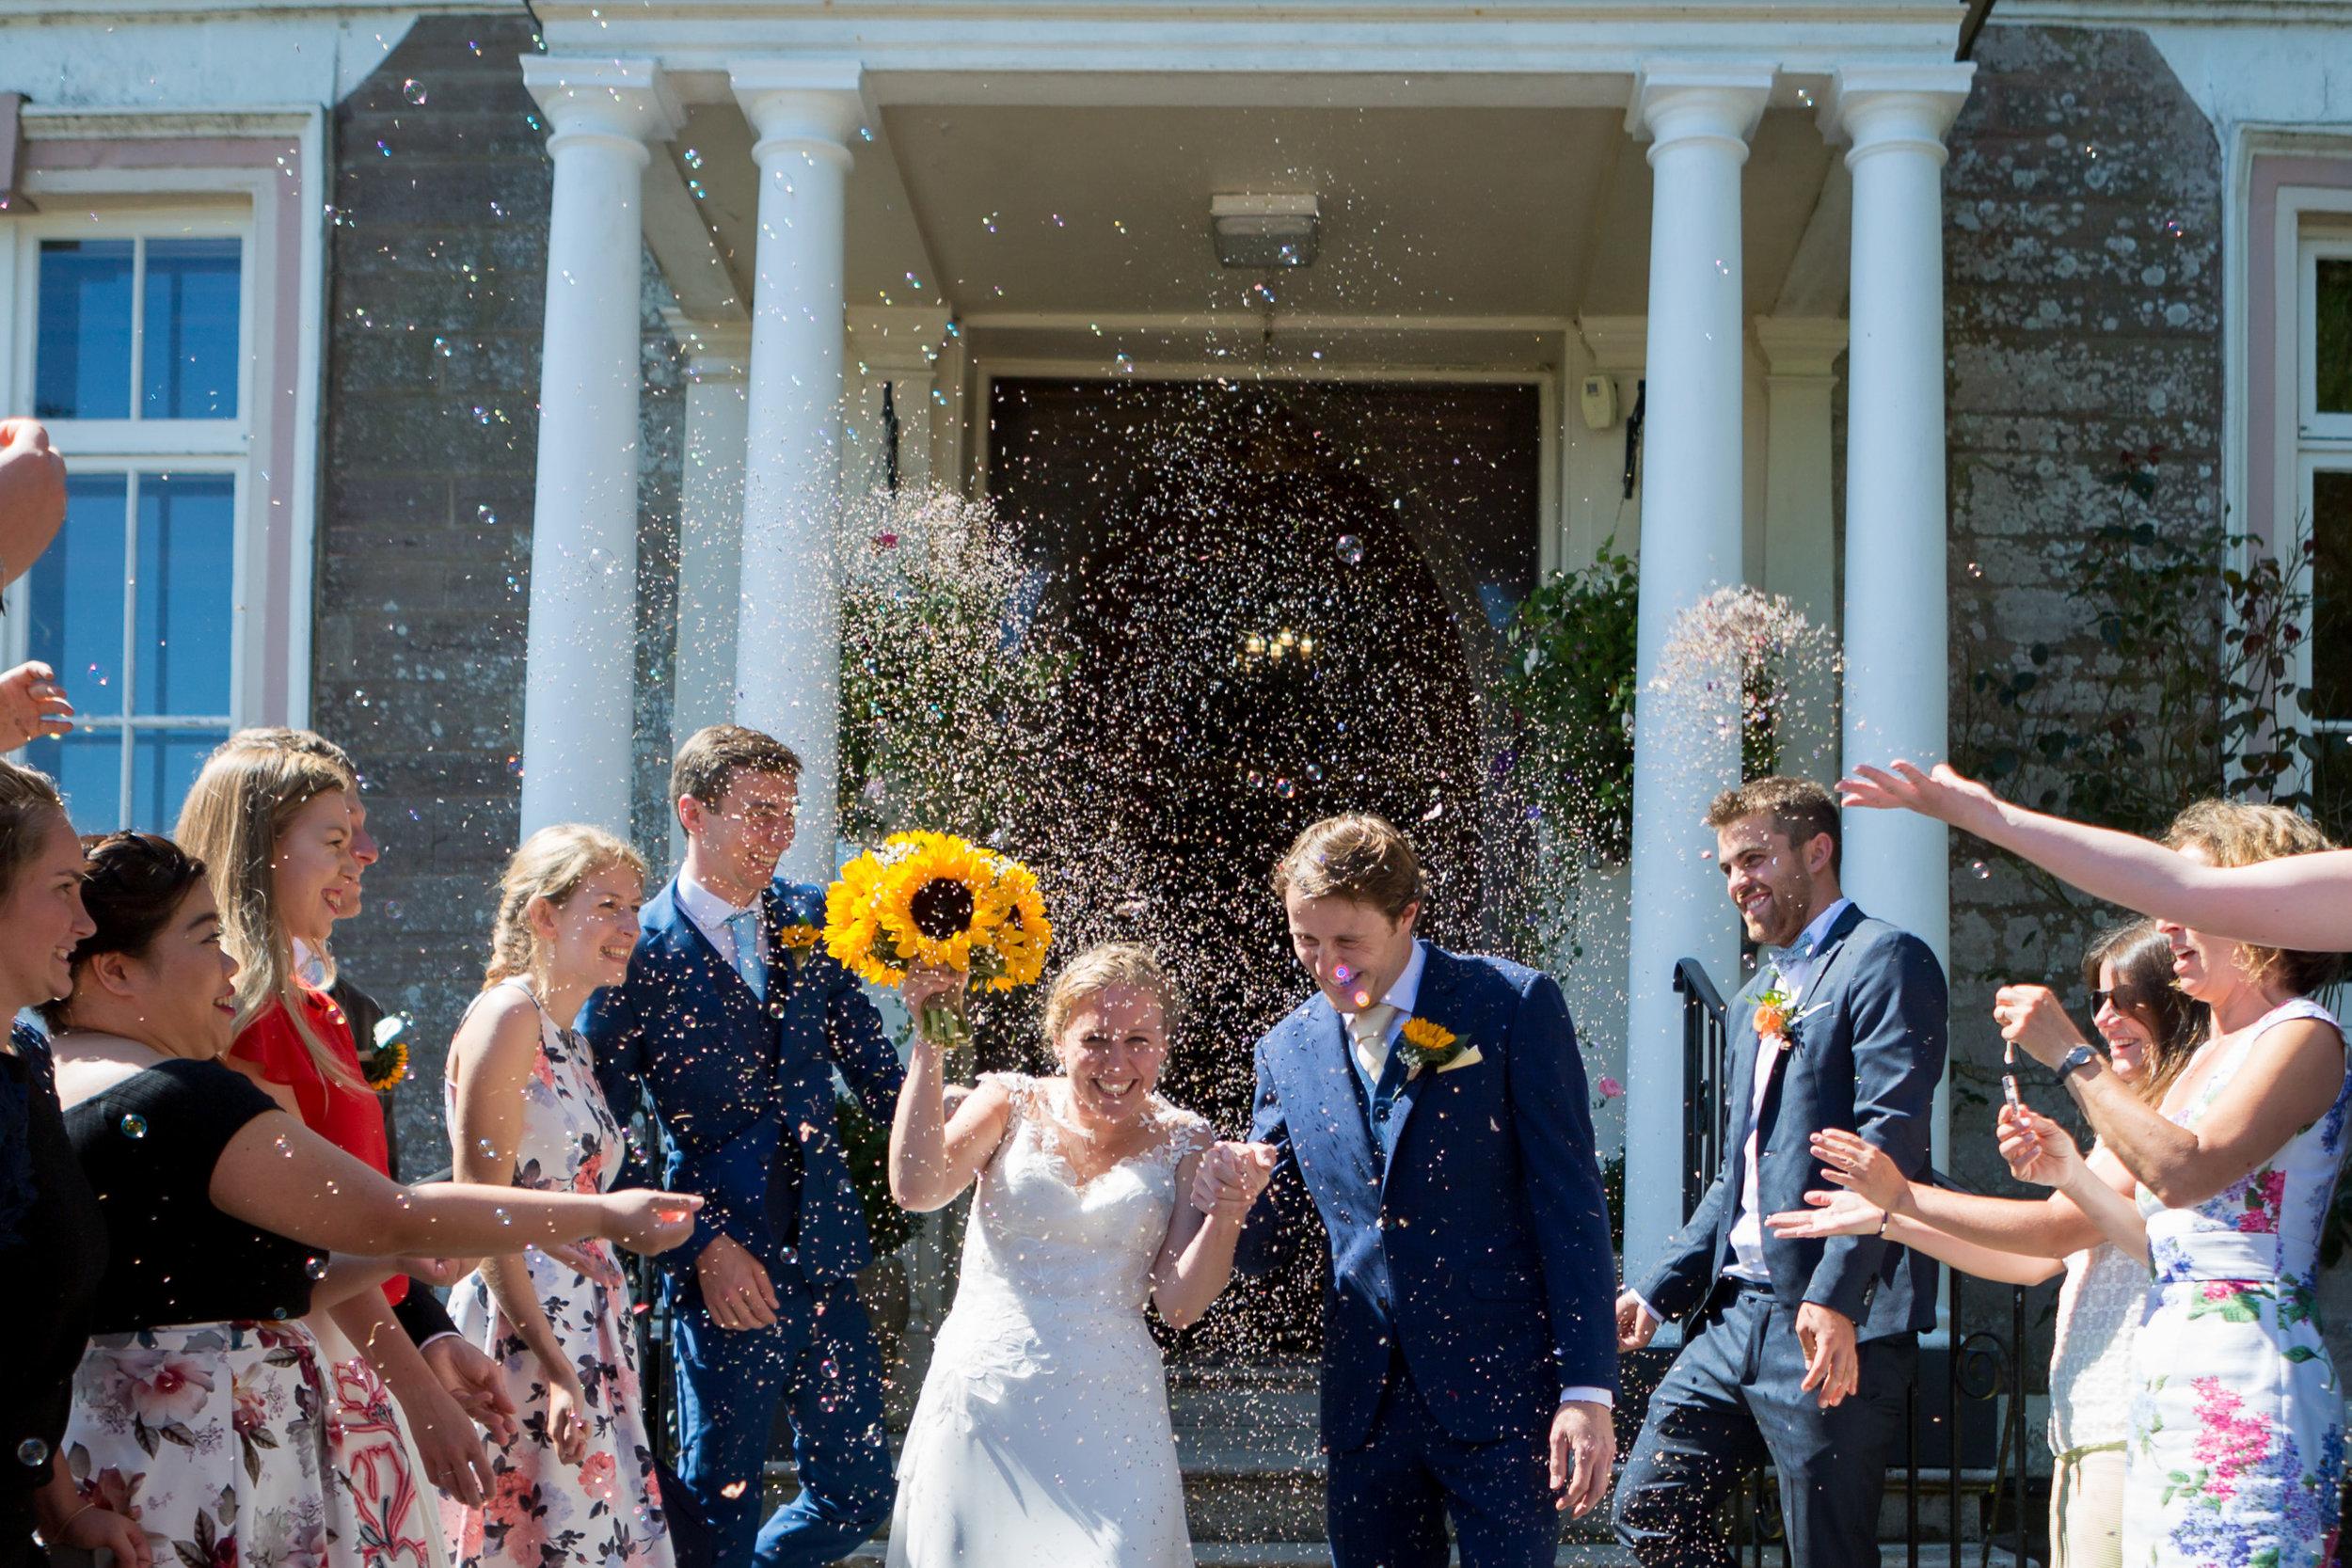 Bucklands-Tout-Saints-Hotel-Devon-Wedding-Photography-13.jpg